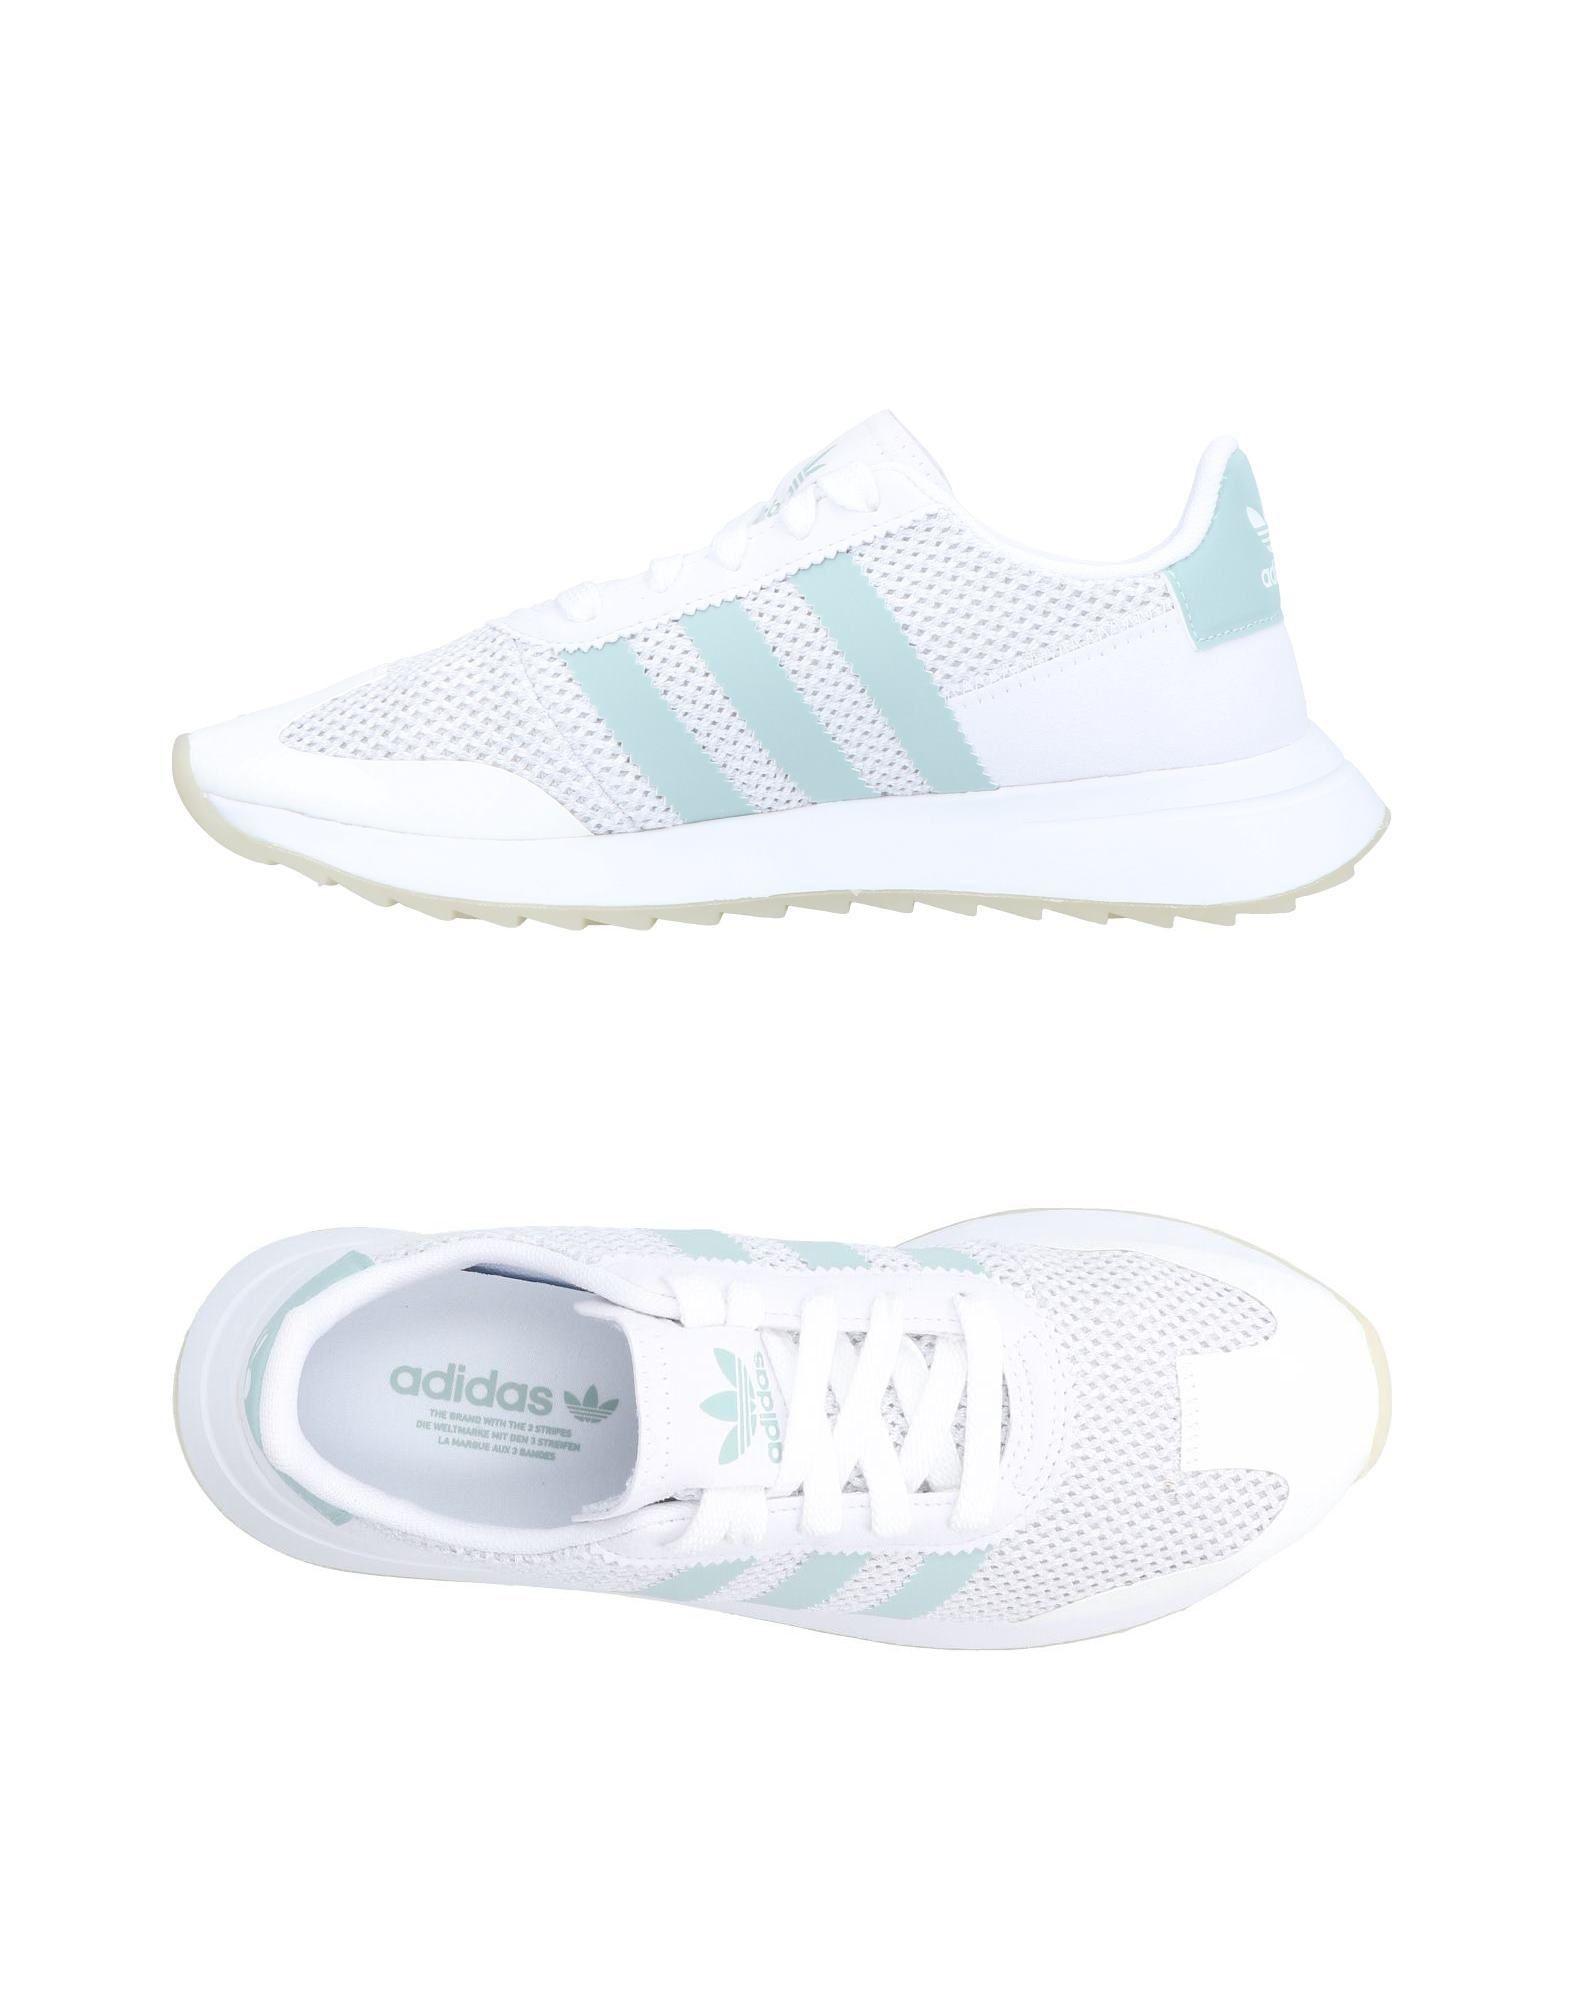 best service ea92c 84630 Adidas Originals Παπουτσια Παπούτσια Τένις Χαμηλά